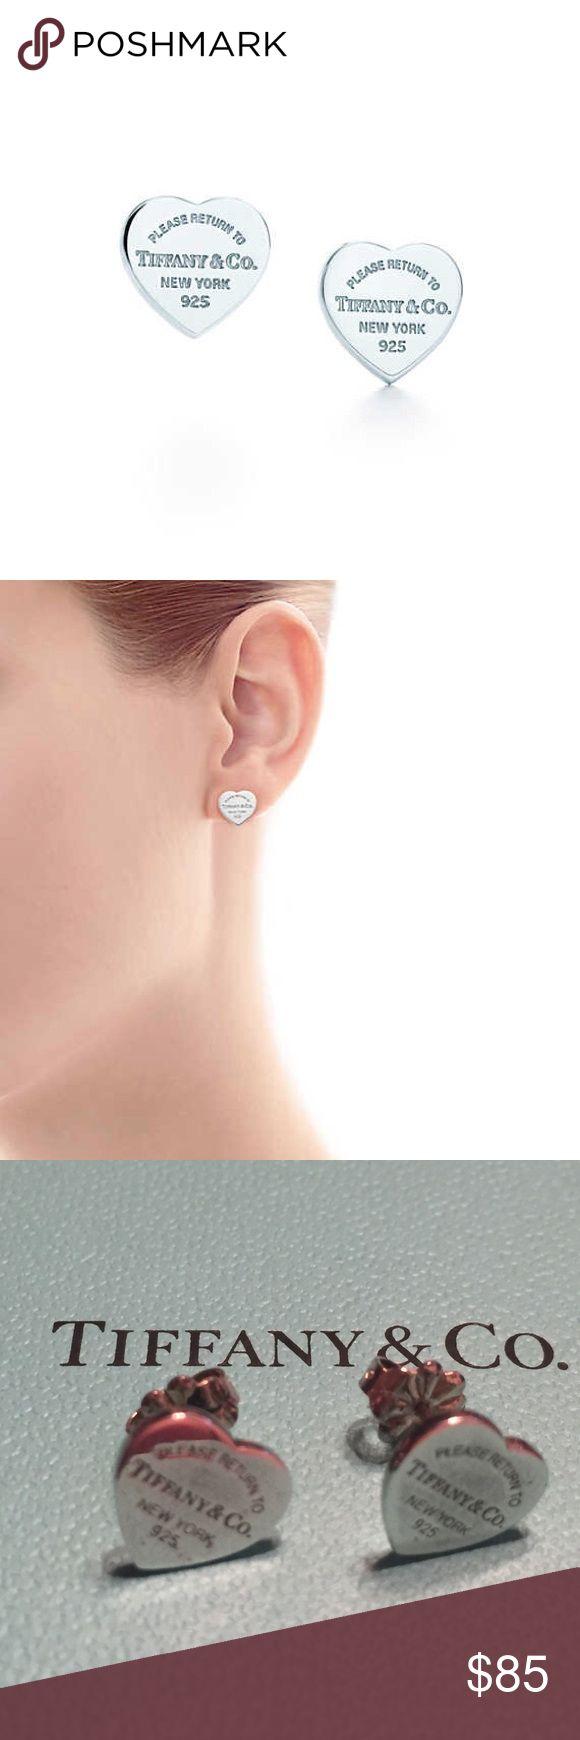 Tiffany Co Return To Mini Heart Earring Pair Of Clic Tag Earrings